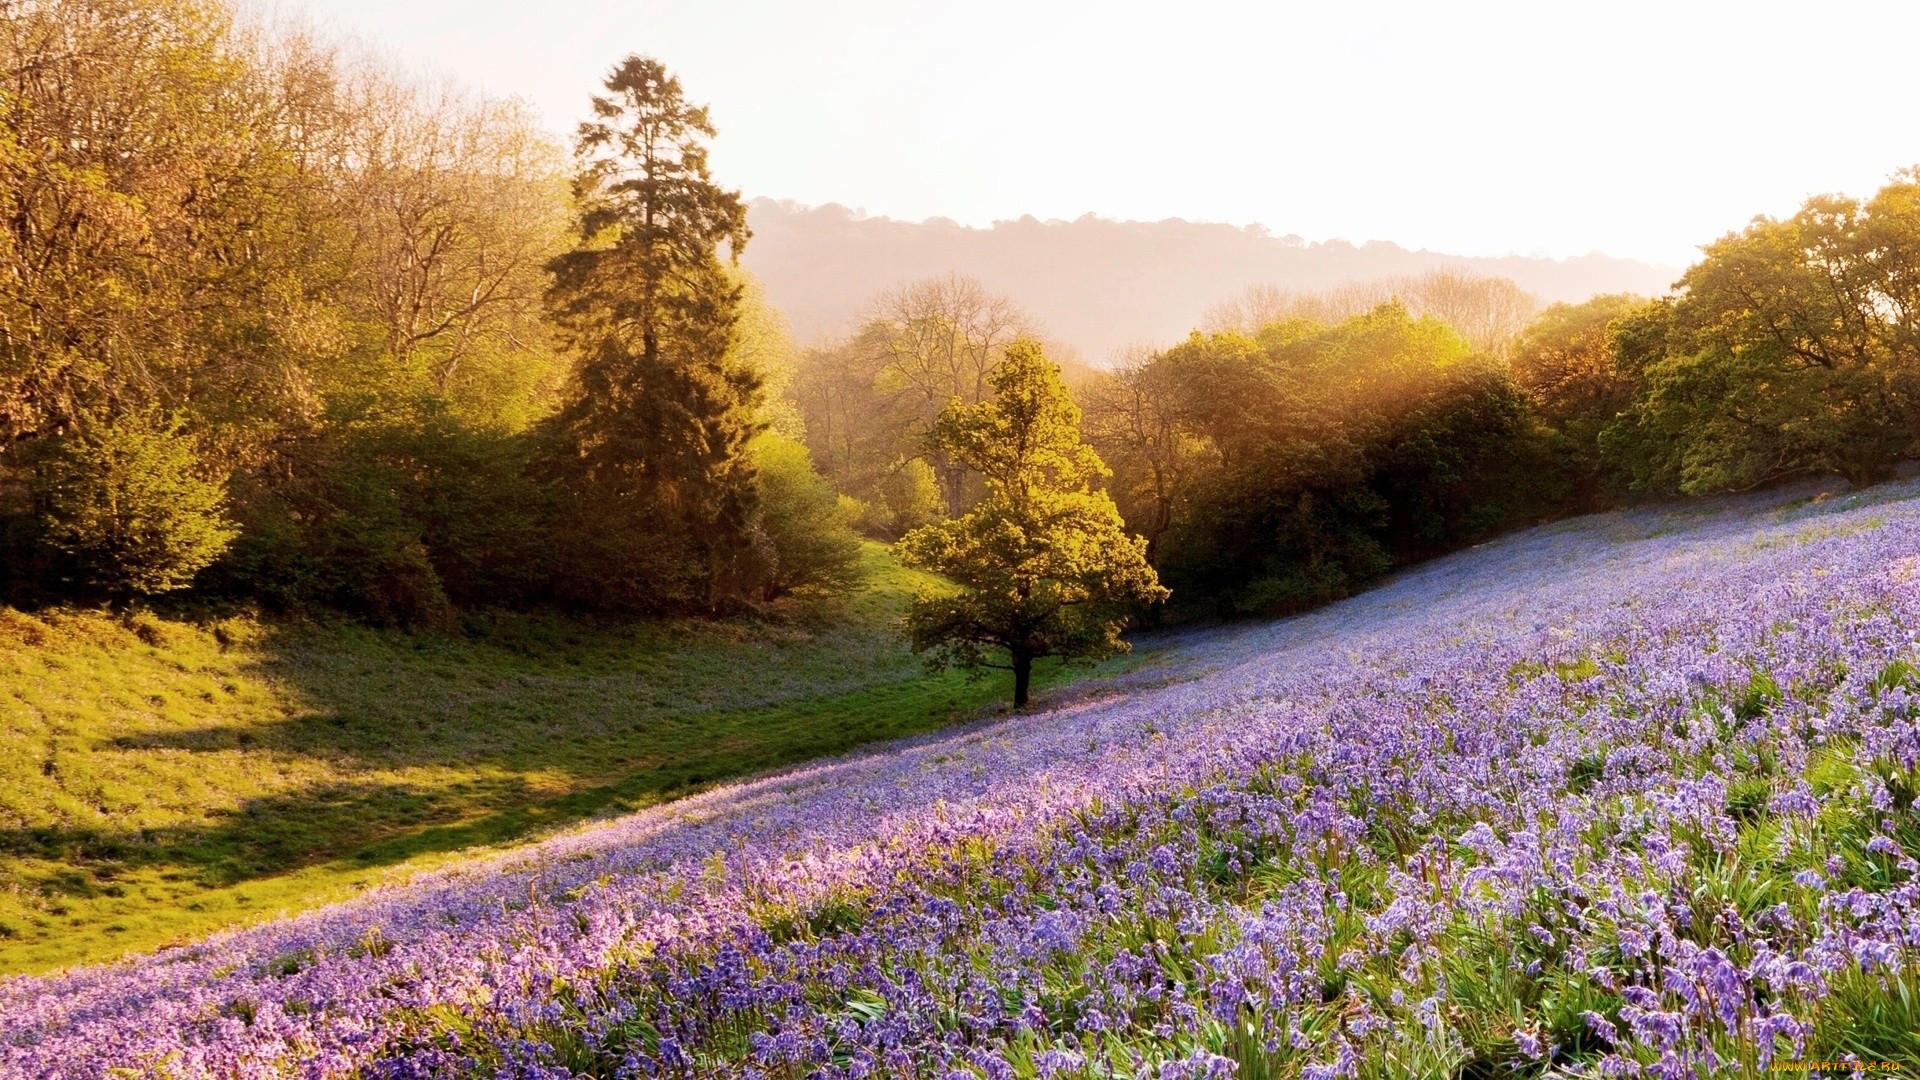 Весна лето природа фото